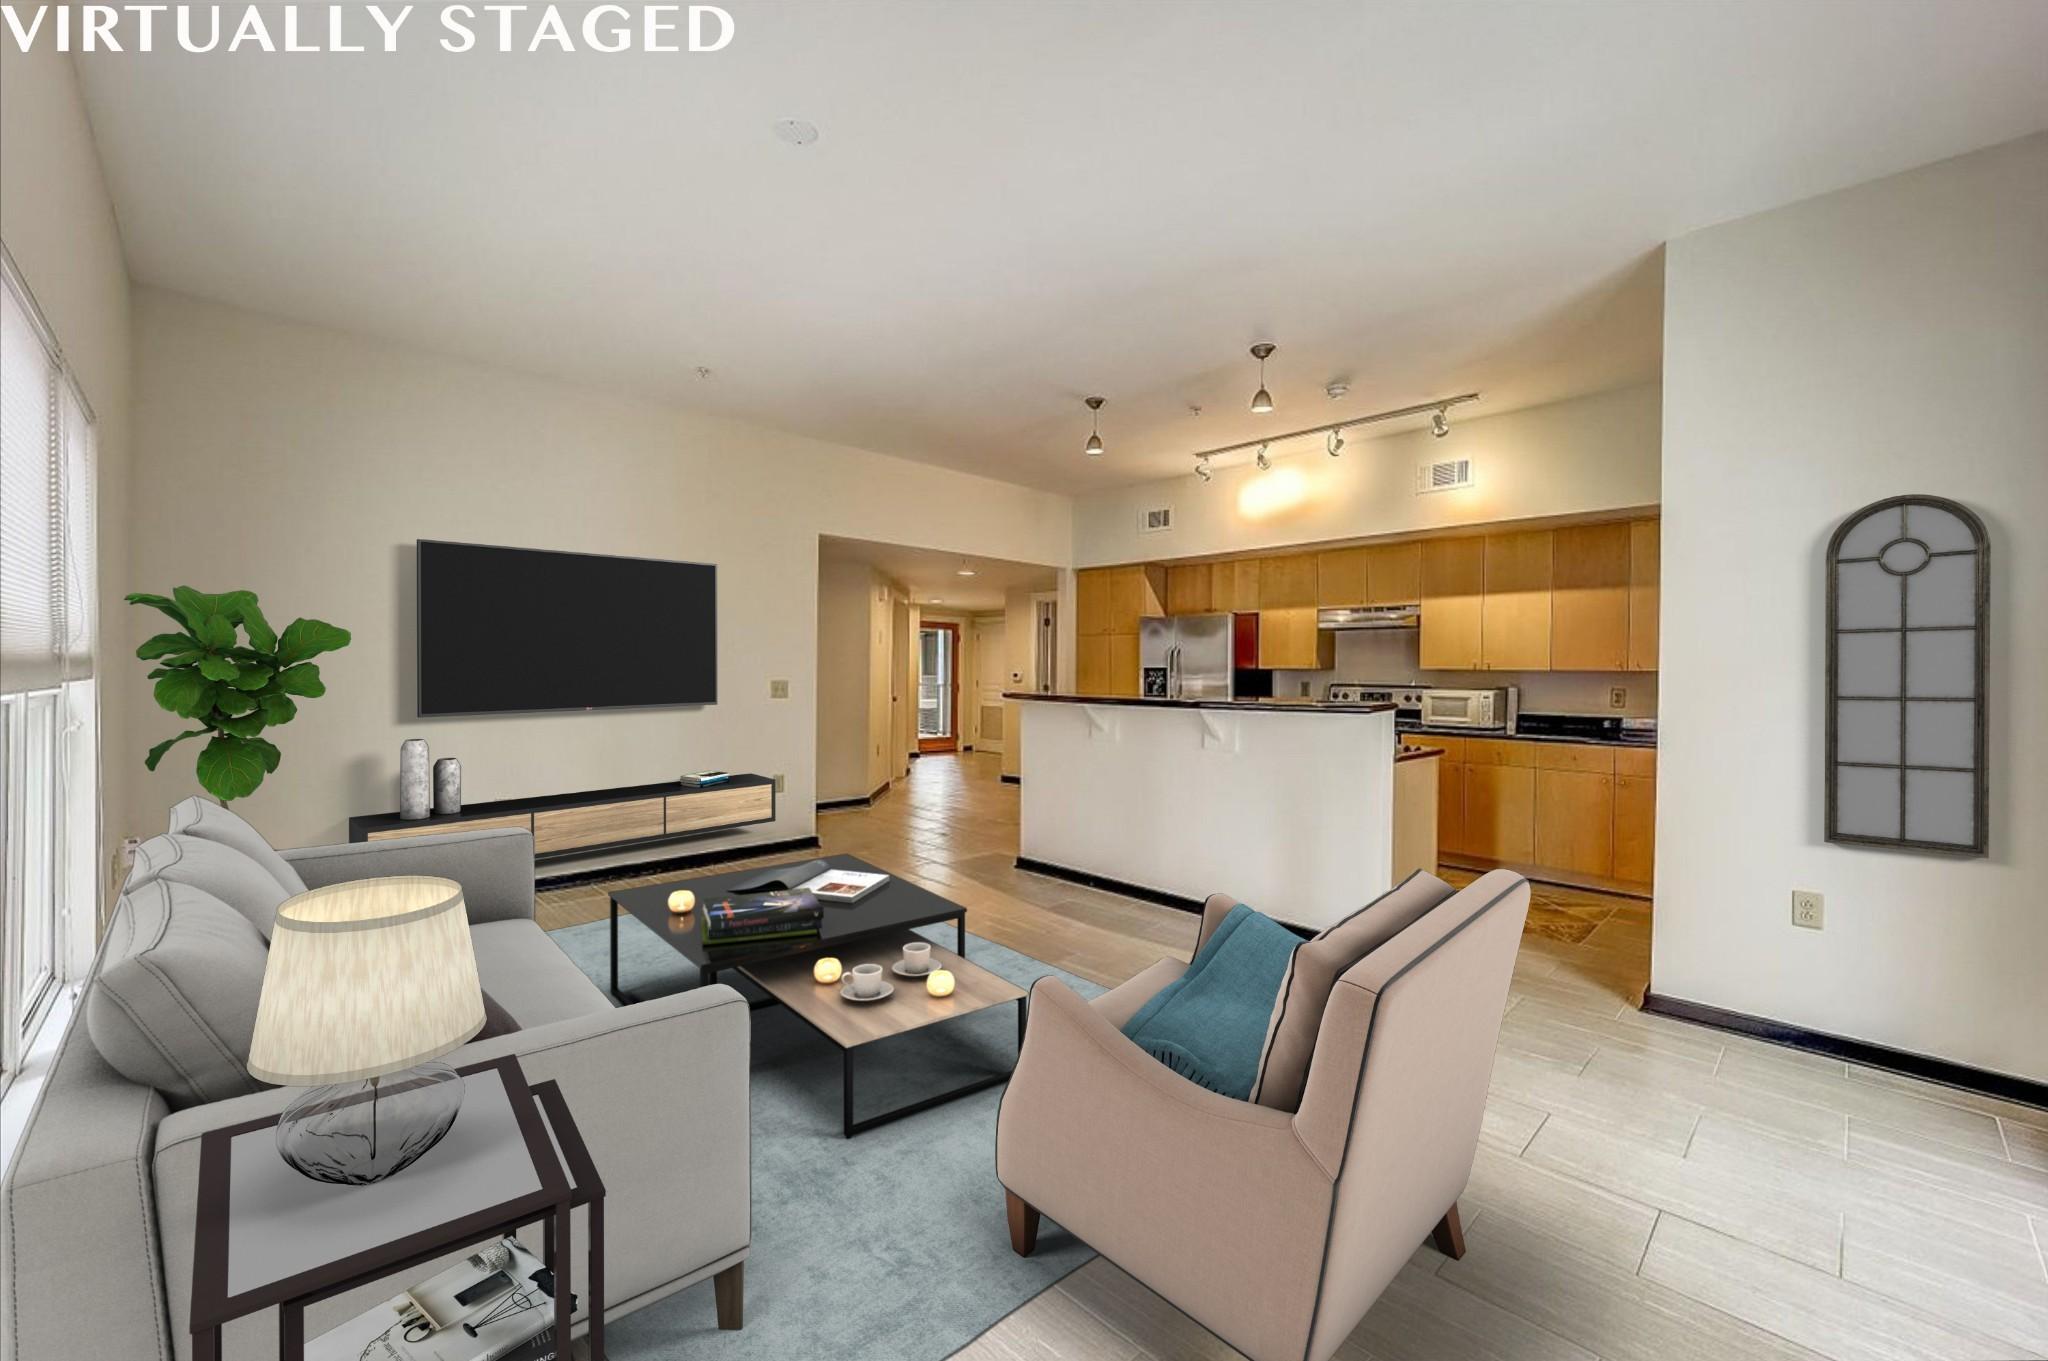 807 18th Ave S #209 Property Photo - Nashville, TN real estate listing